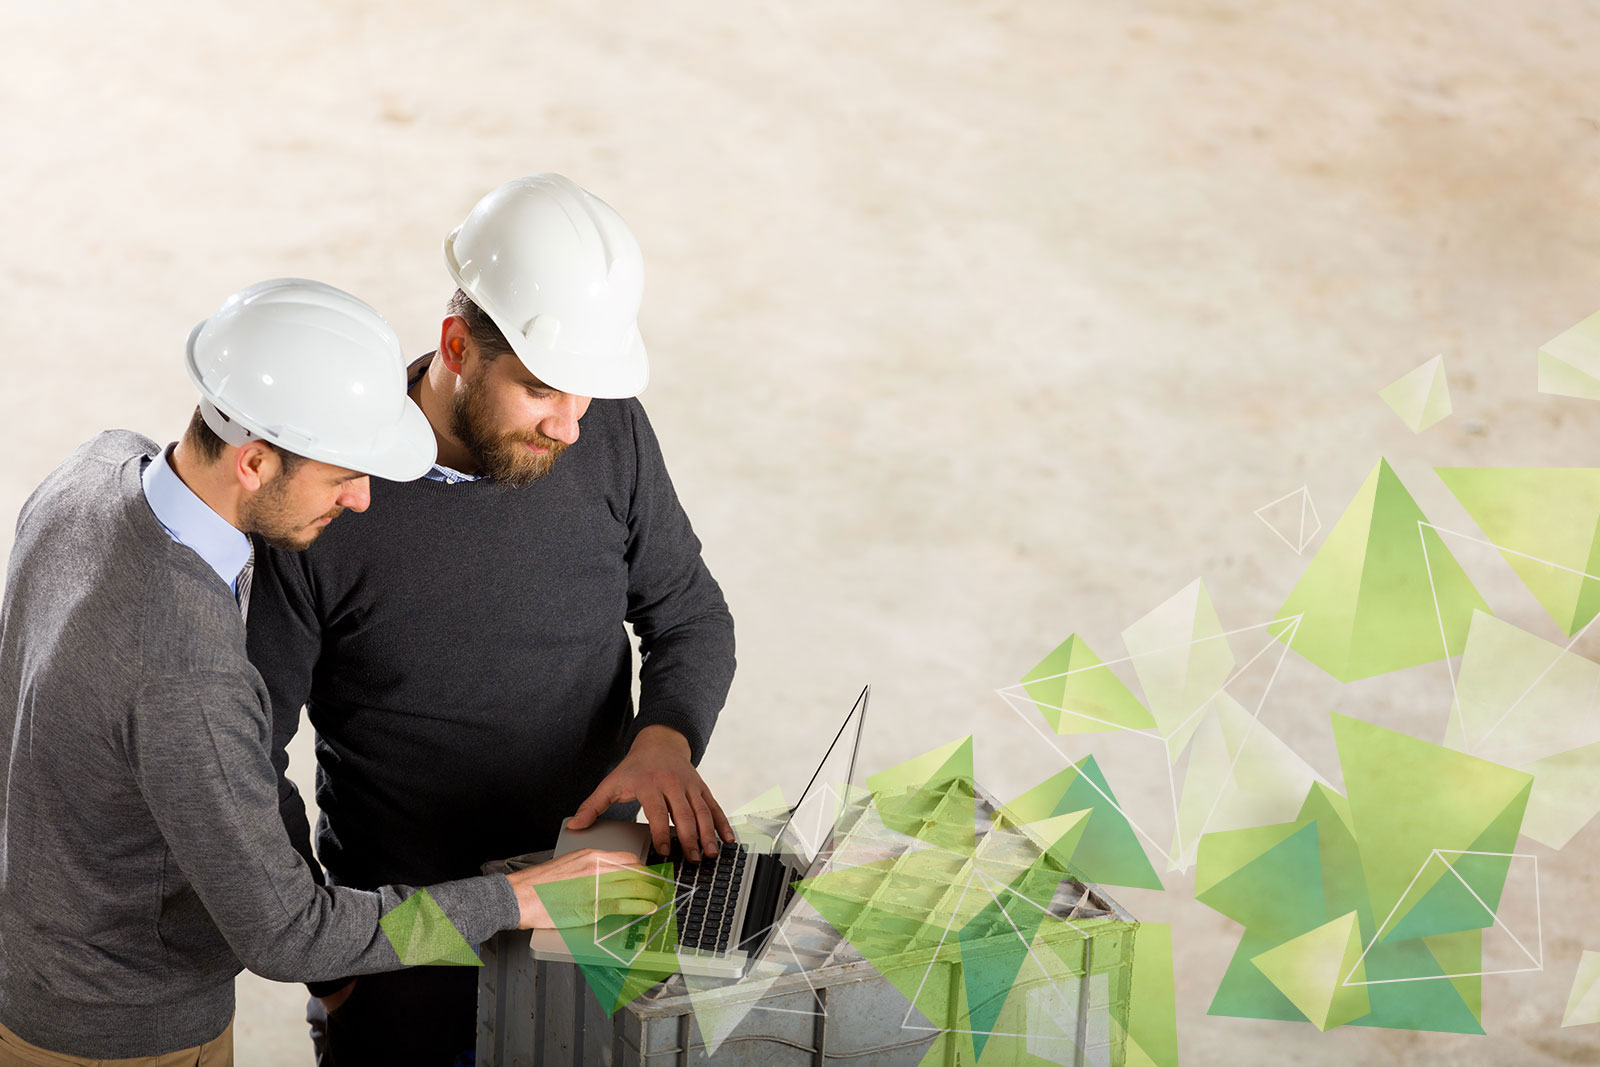 abm productivity organisational development